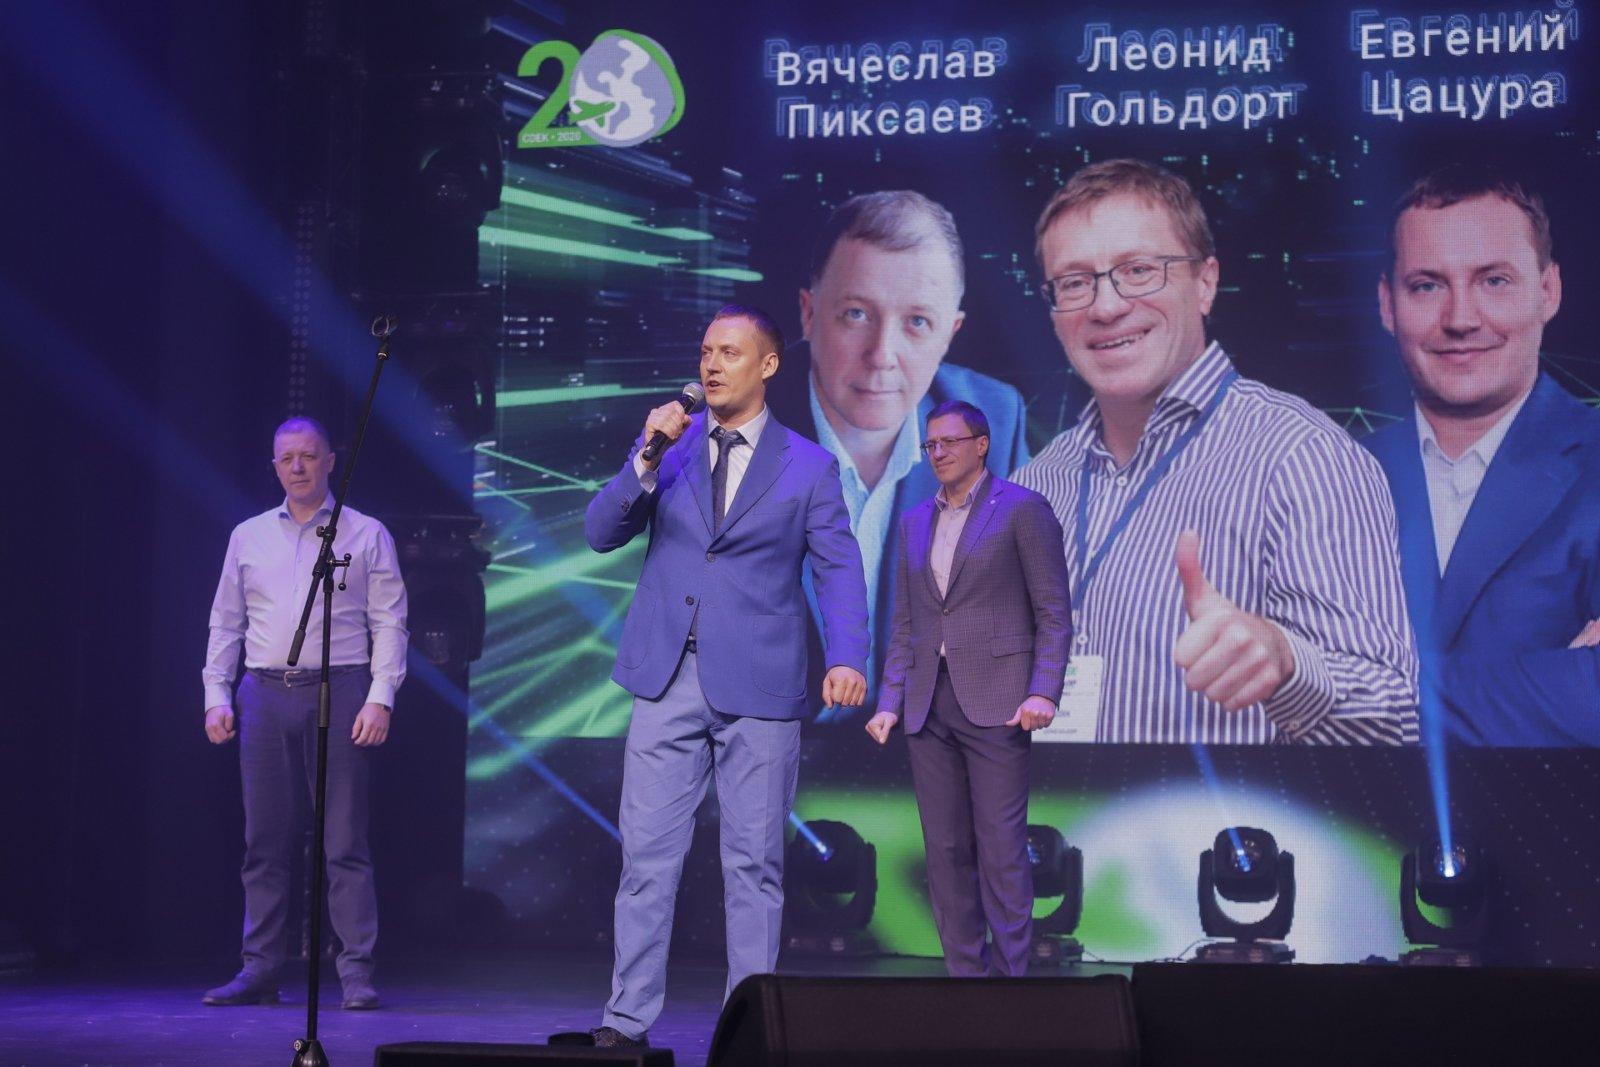 Goldort_Picsayev_Cacura